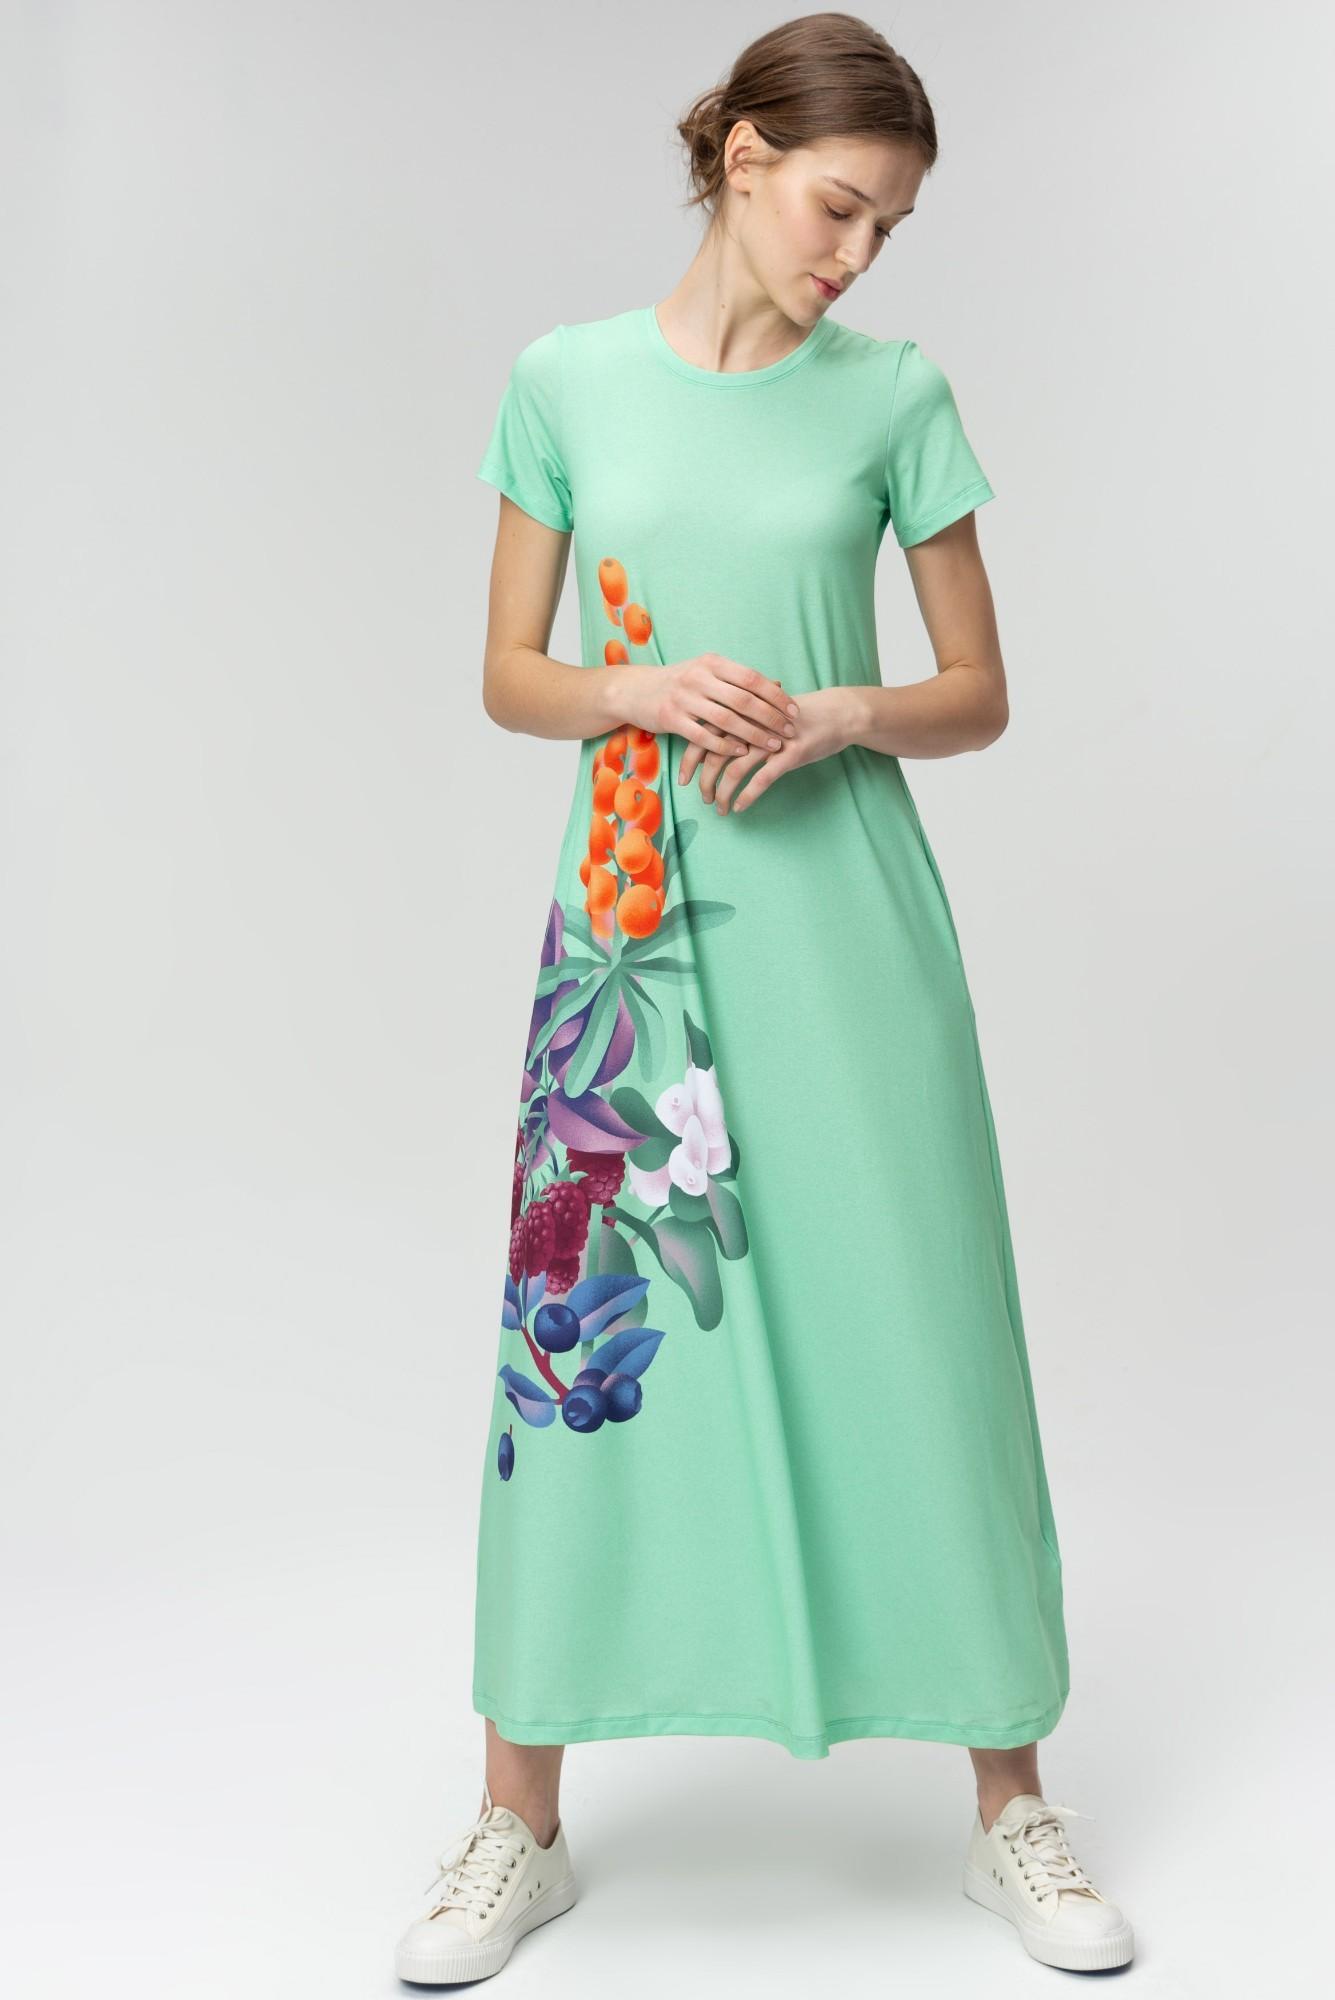 AUDIMAS Ilga tampri marginta suknelė 20FL-007 Mint Garden S